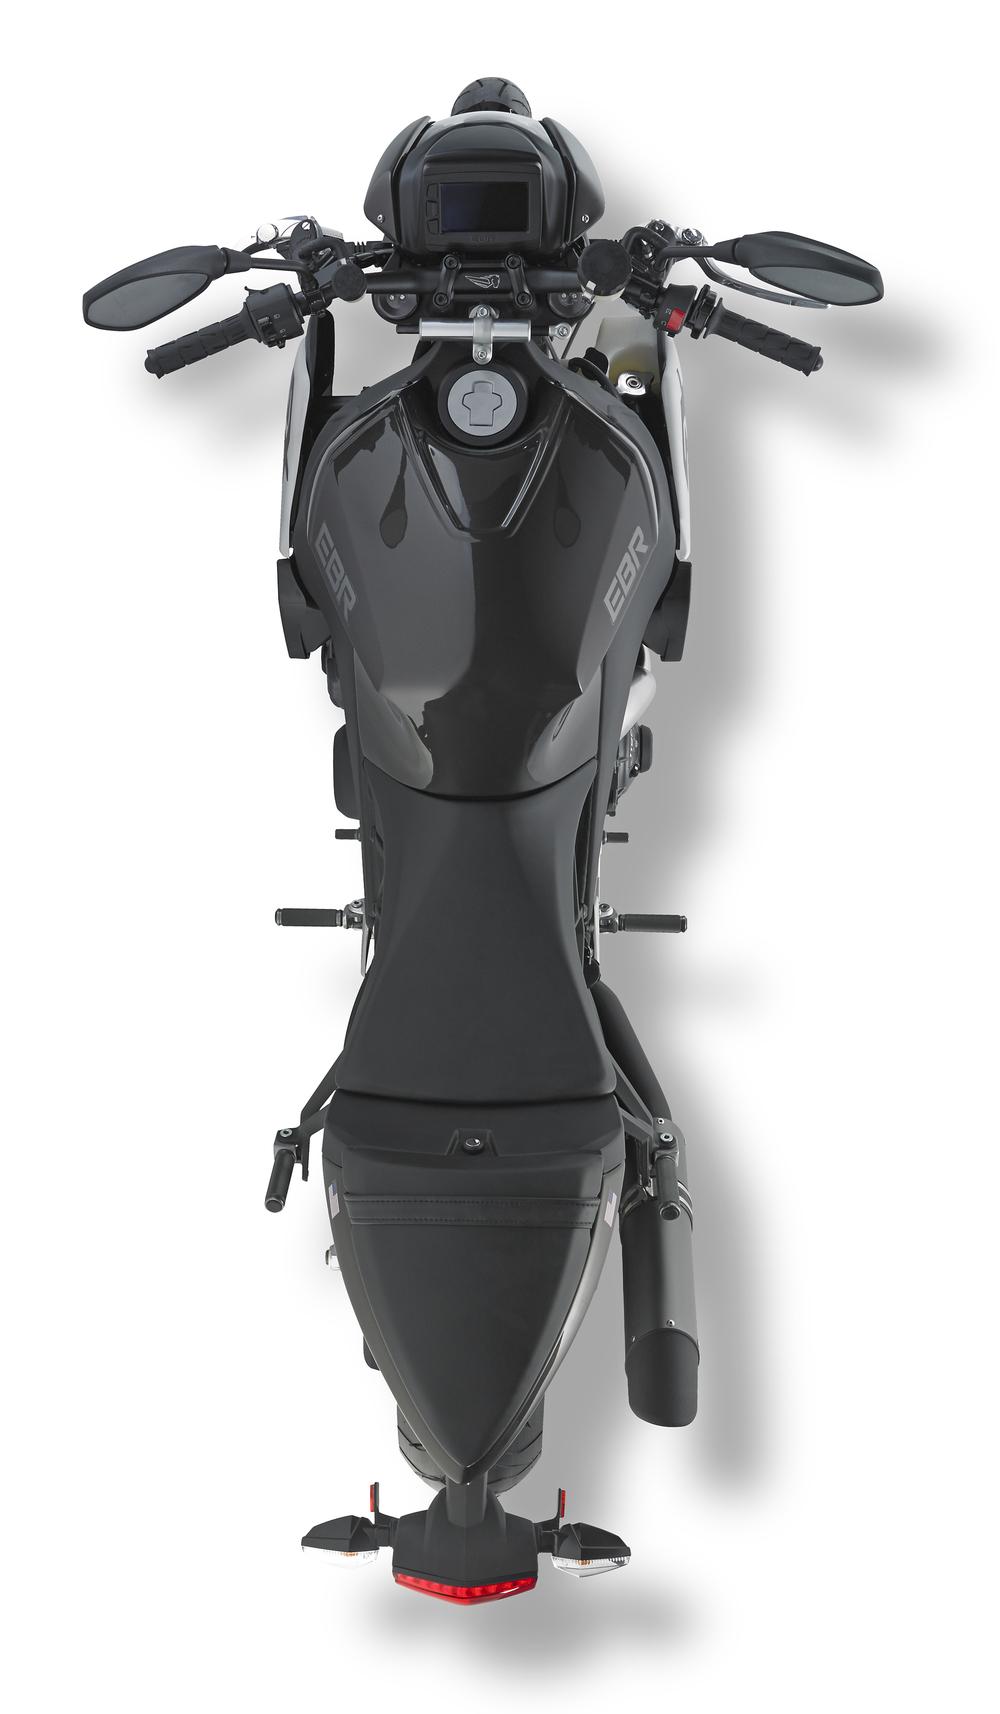 0614-11 EBR   1190SX Black Overhead.jpg